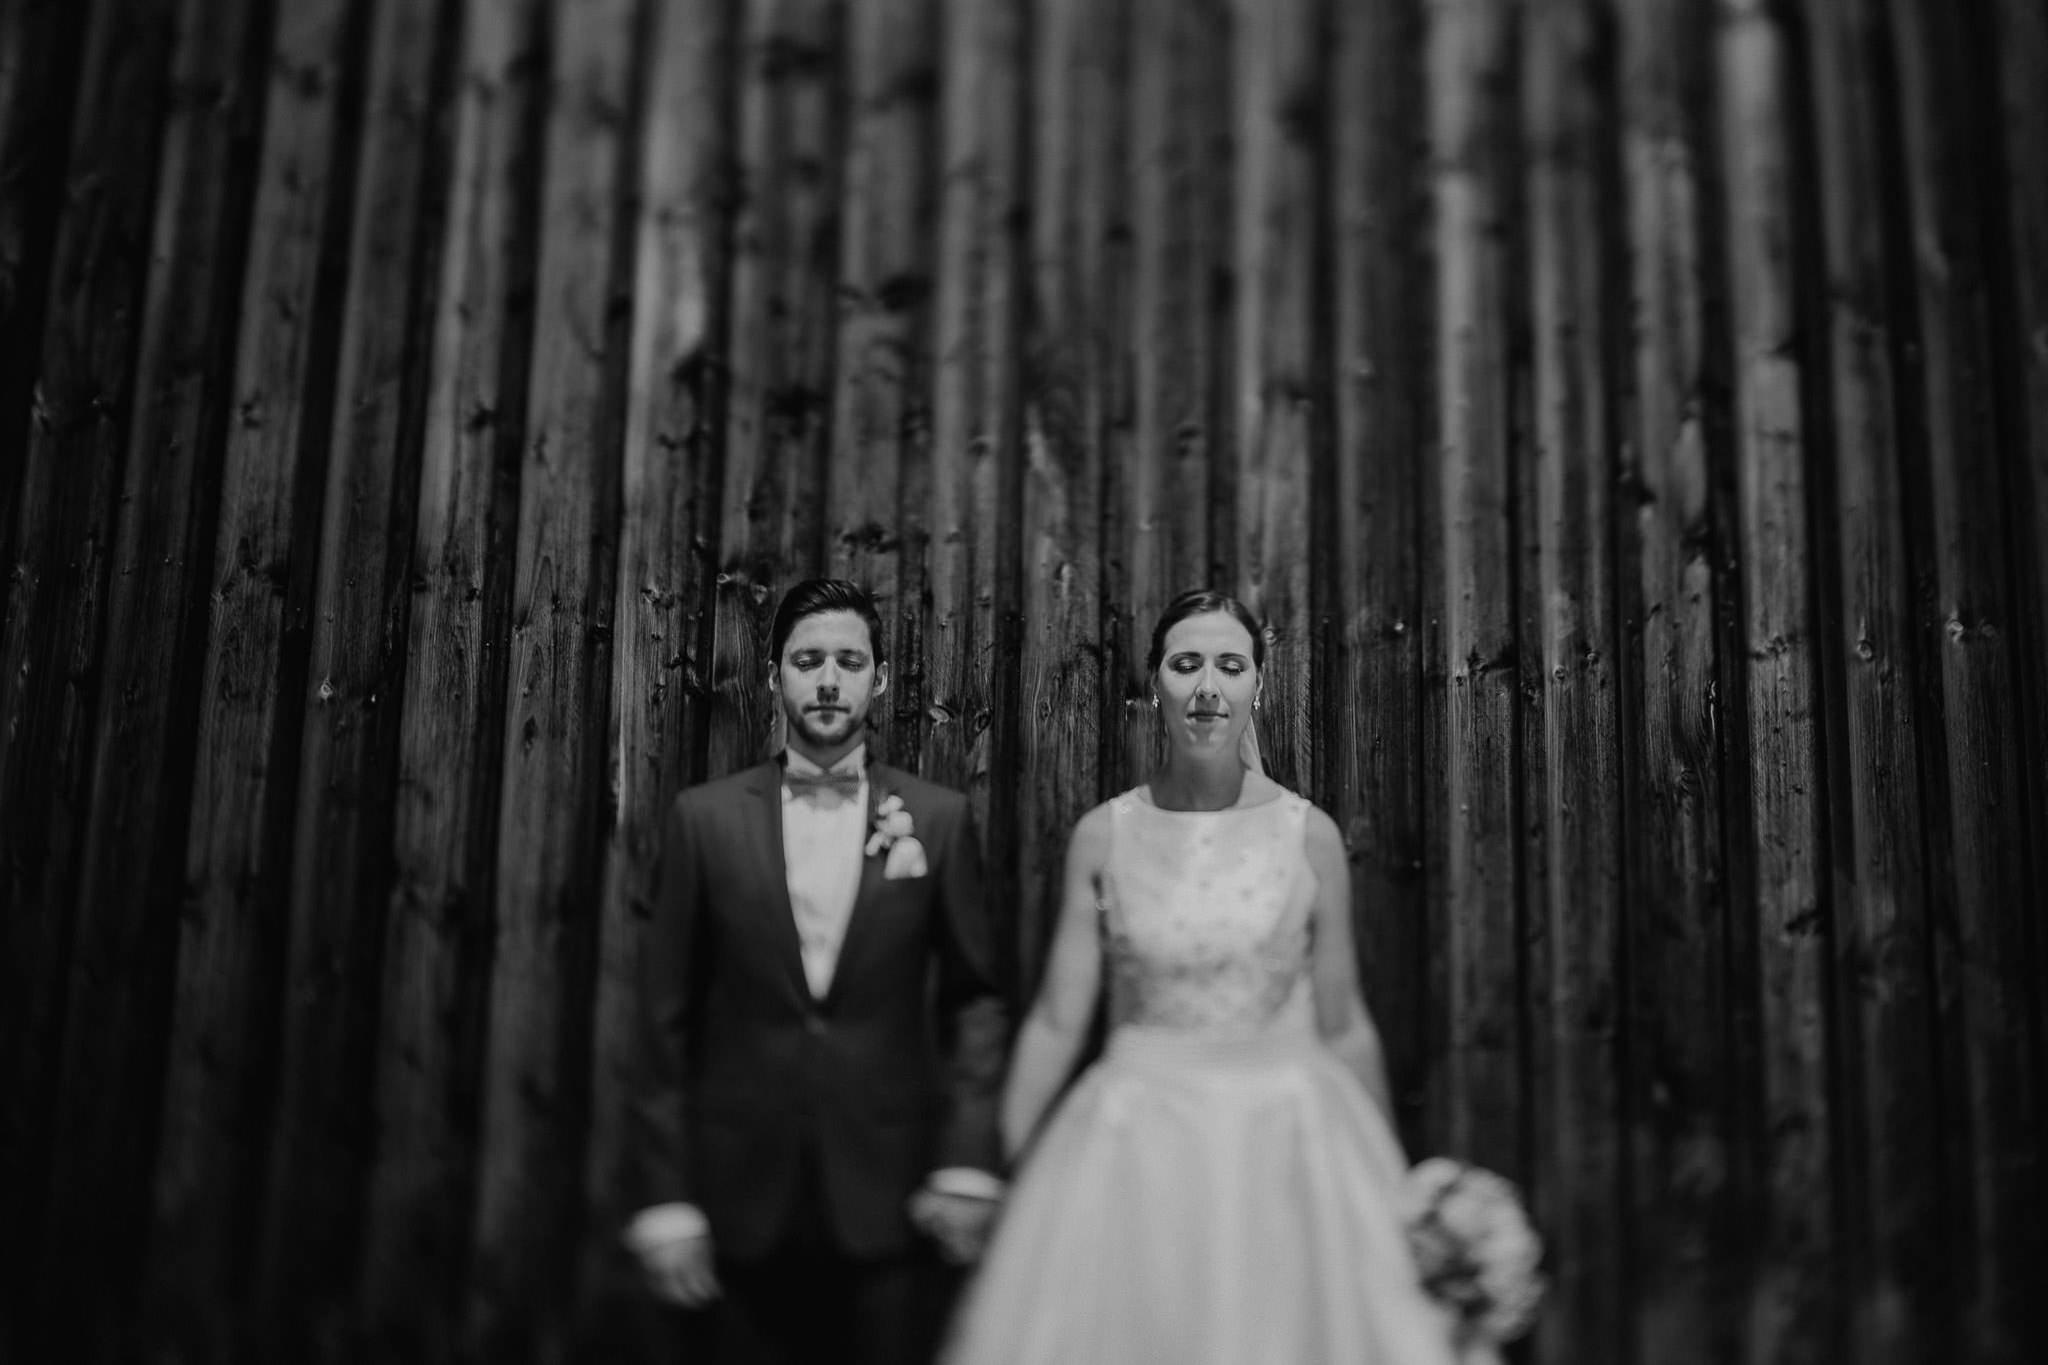 wedding photographer hamilton new zealand 1026 3